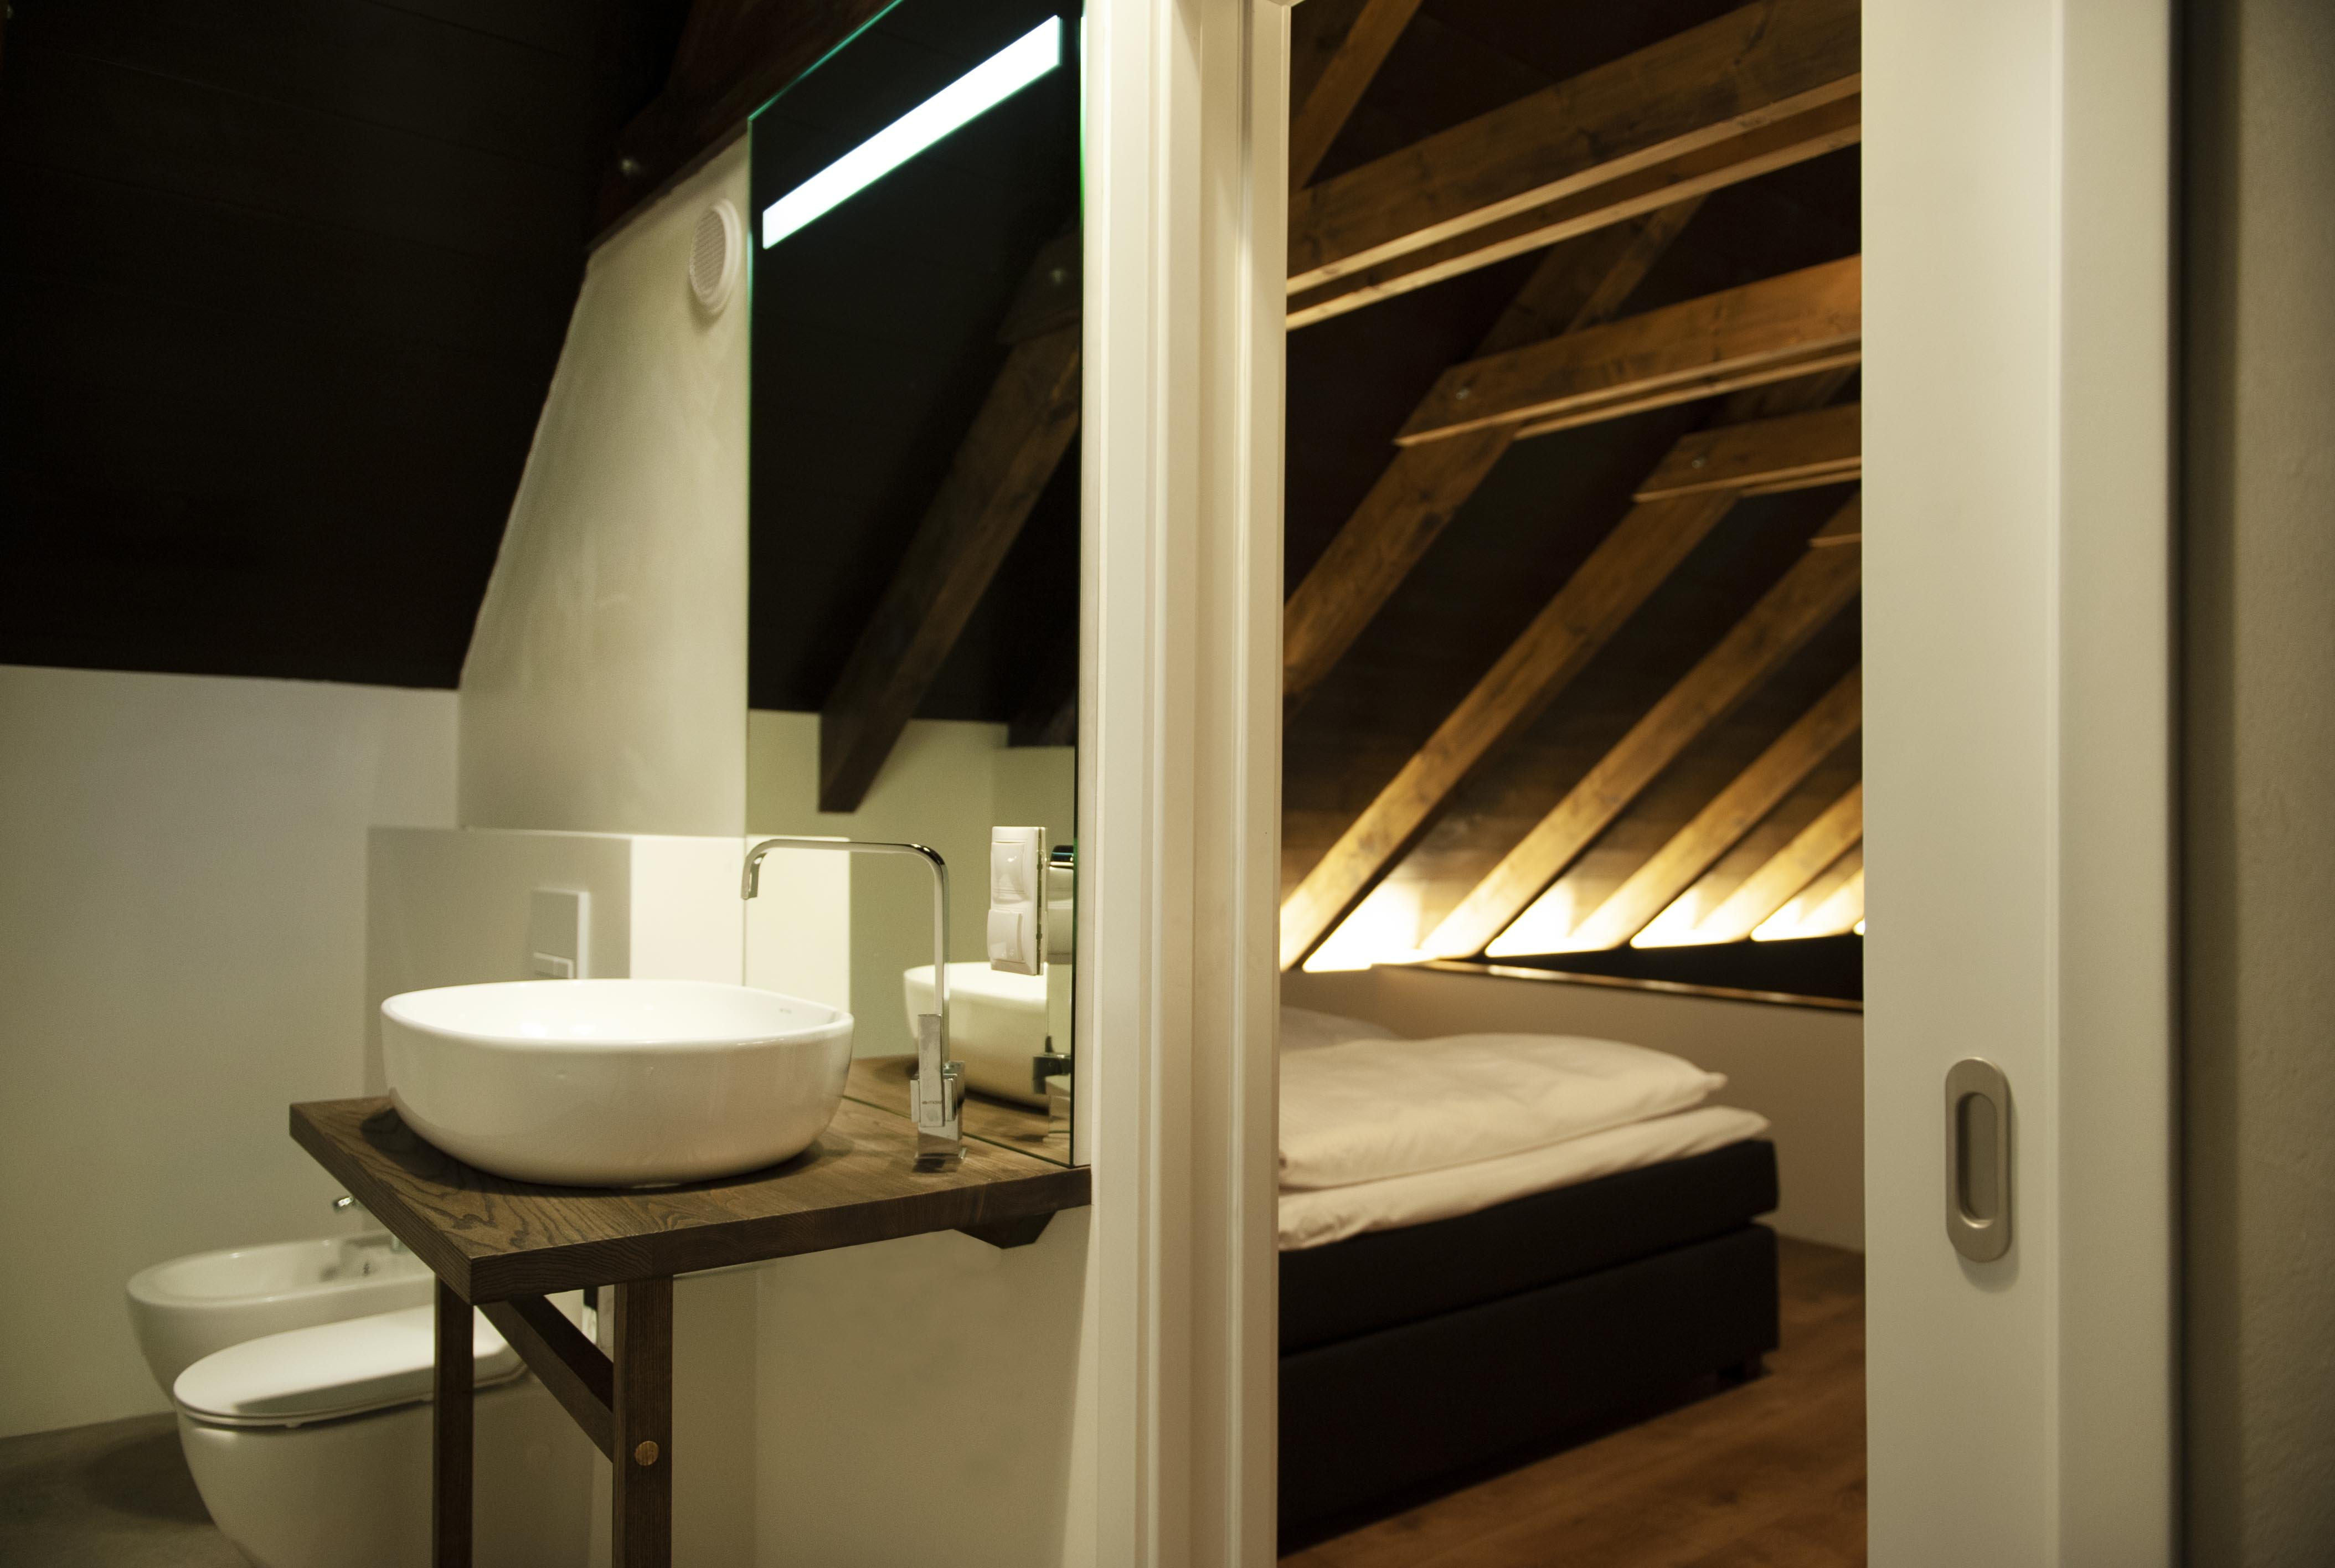 <p>Badkamer boven. Foto: Igor Kozlowski</p>